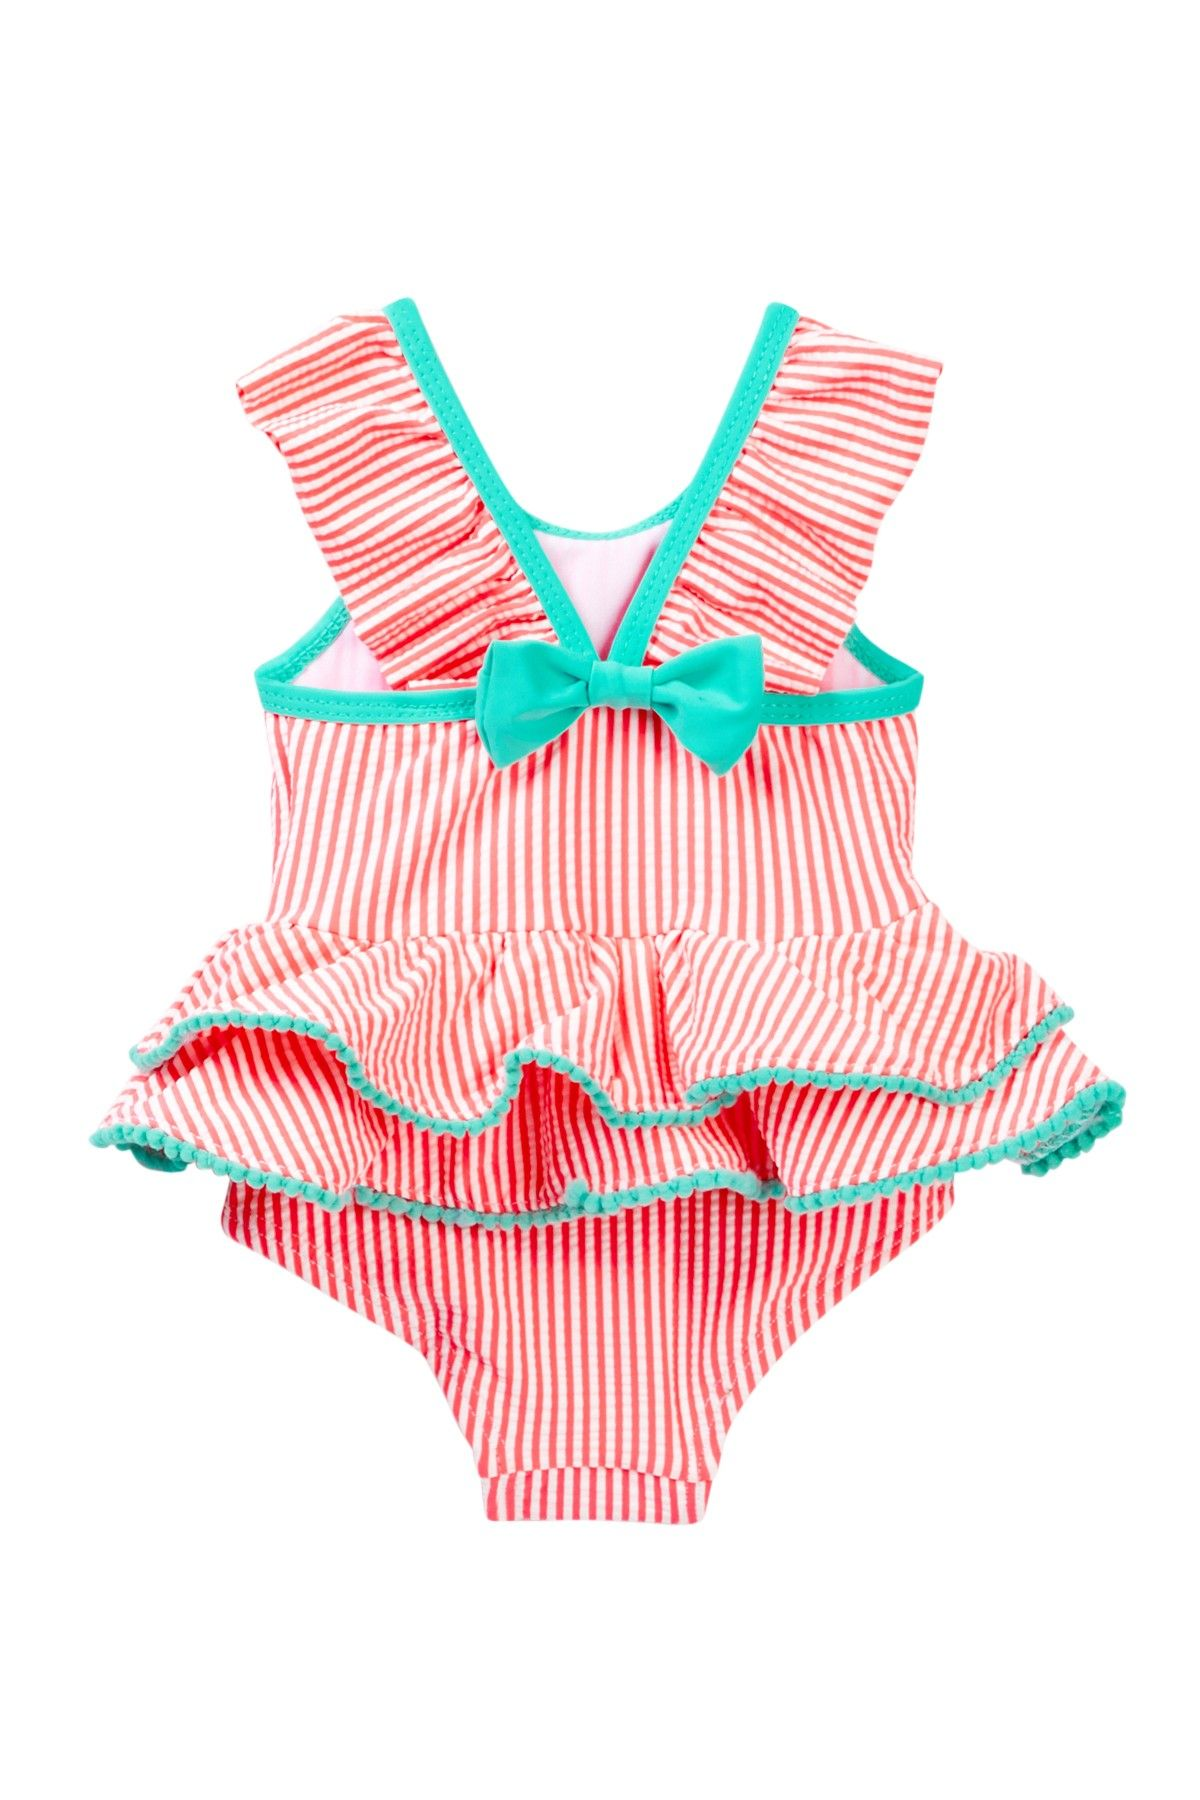 a7ddfbd1c9 Seersucker Tutu One Piece Swimsuit (Baby Girls 3-9M) by Wetsuit Club on  @HauteLook